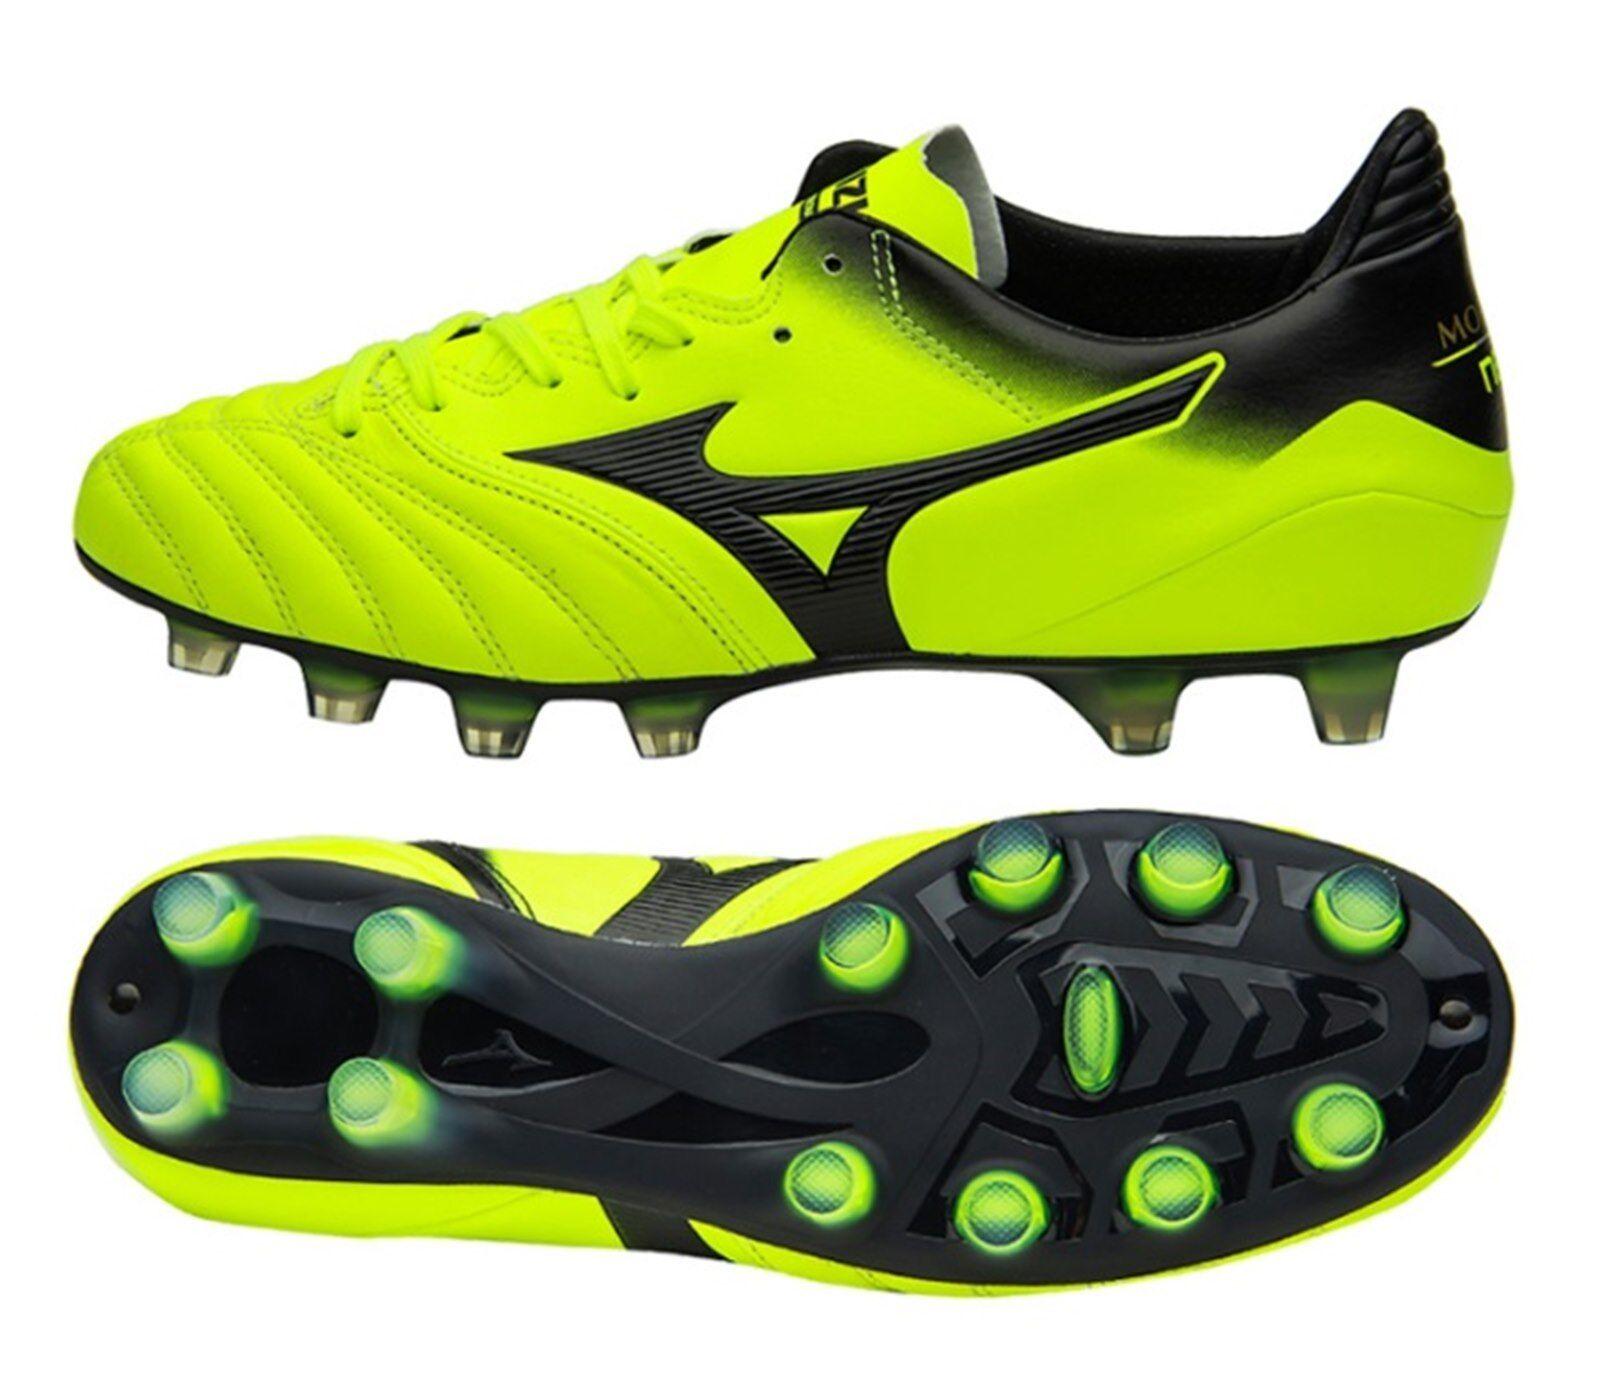 Mizuno Men Morelia Neo KL MD Cleats Soccer Football Volt Schuhes Spike P1GA185809